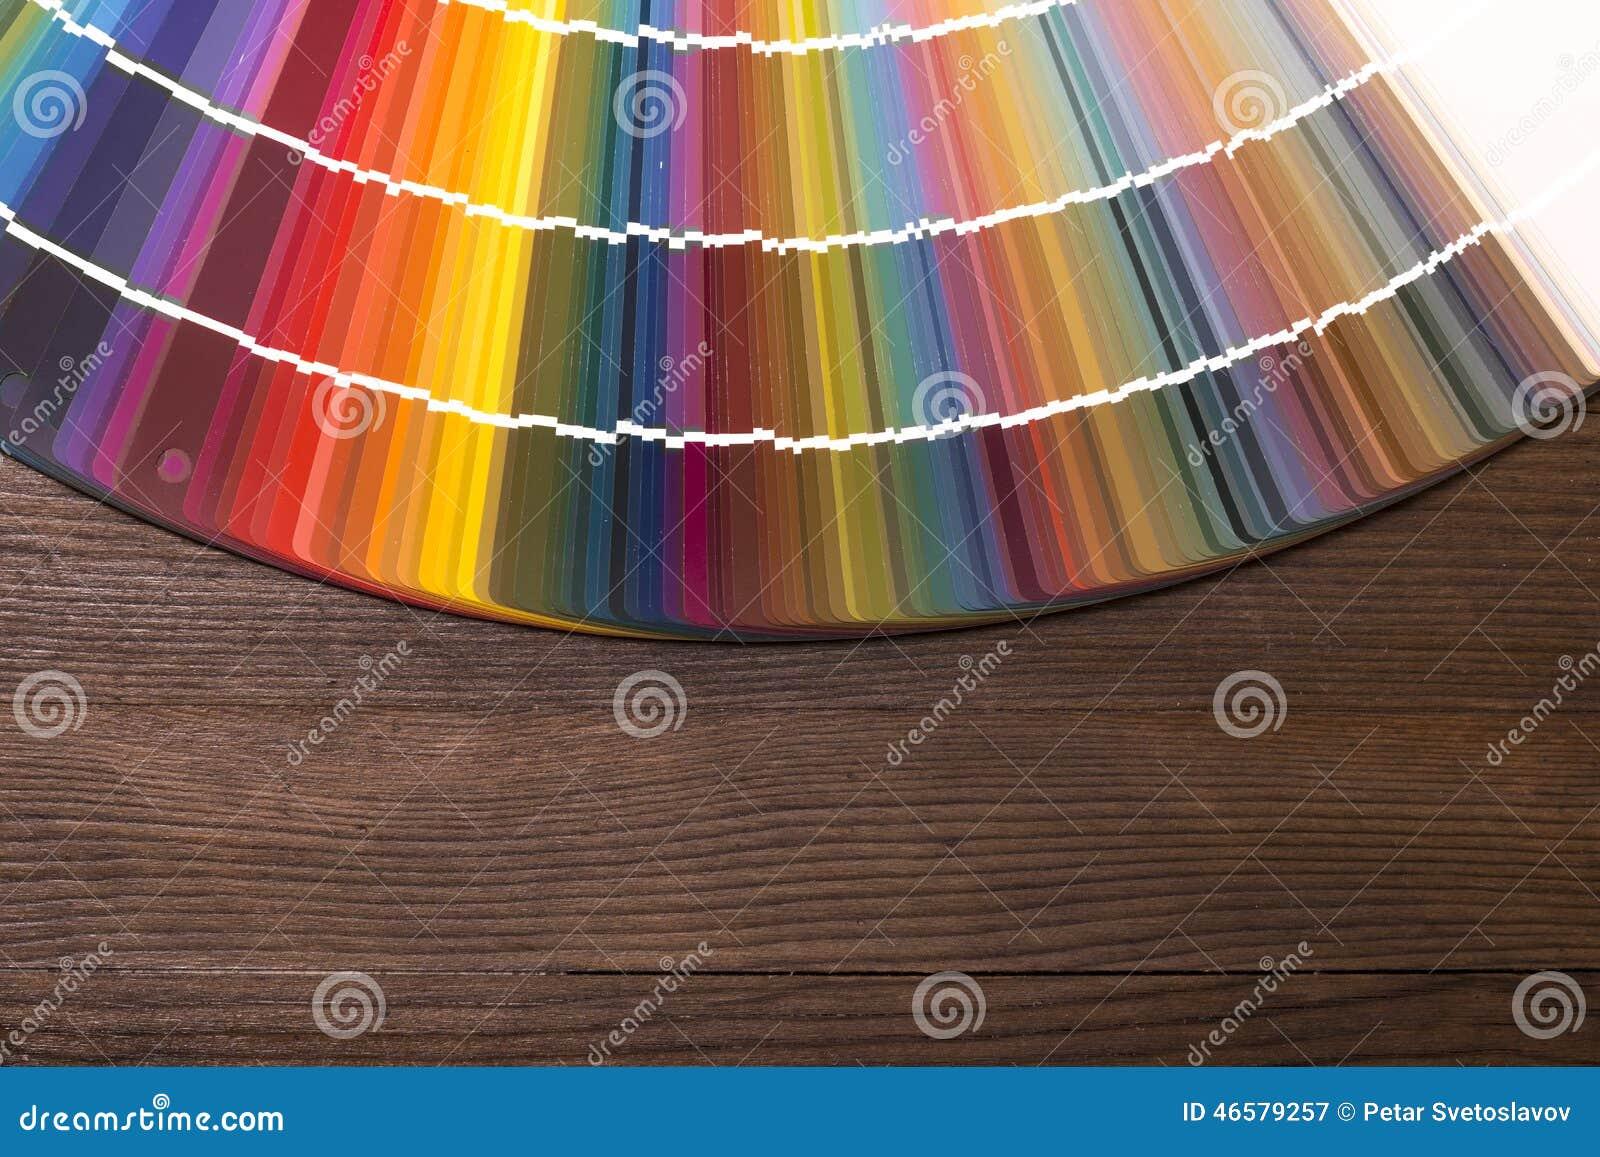 color catalogue on wooden desk stock photo image 46579257. Black Bedroom Furniture Sets. Home Design Ideas